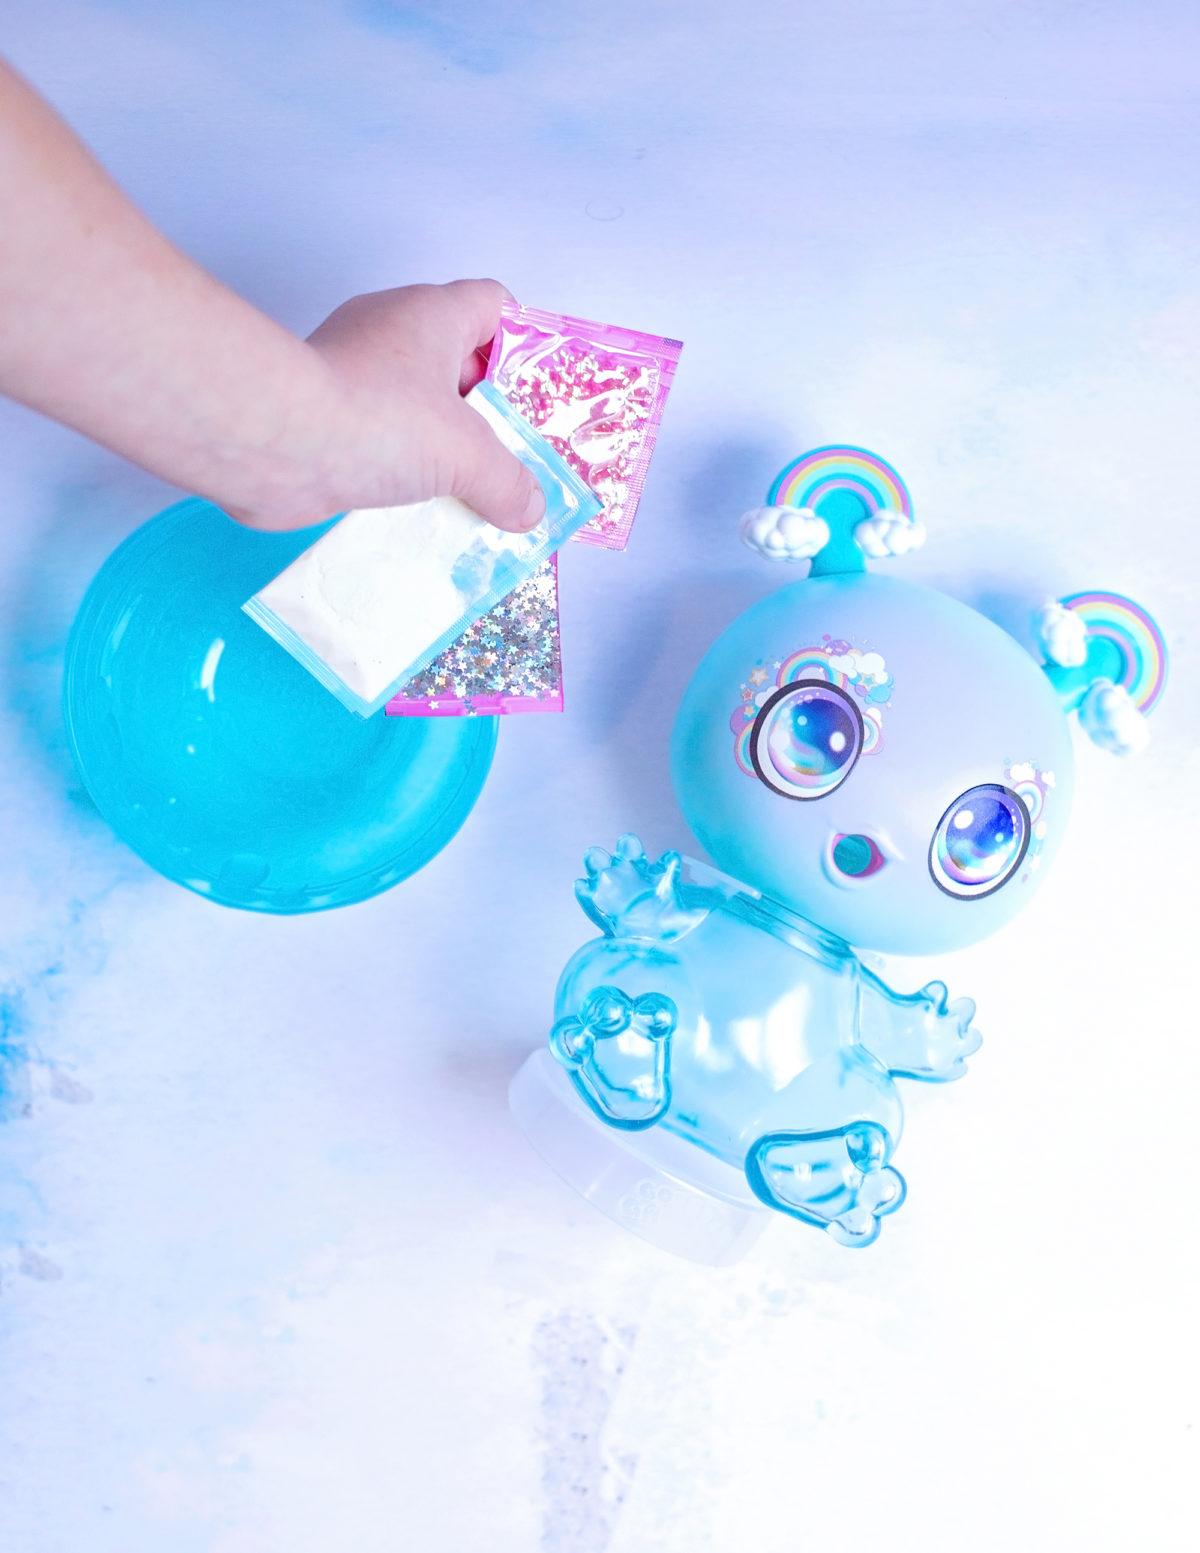 Slurp 'n' Slime Goo Drop Mixture Goo Goo Galaxy